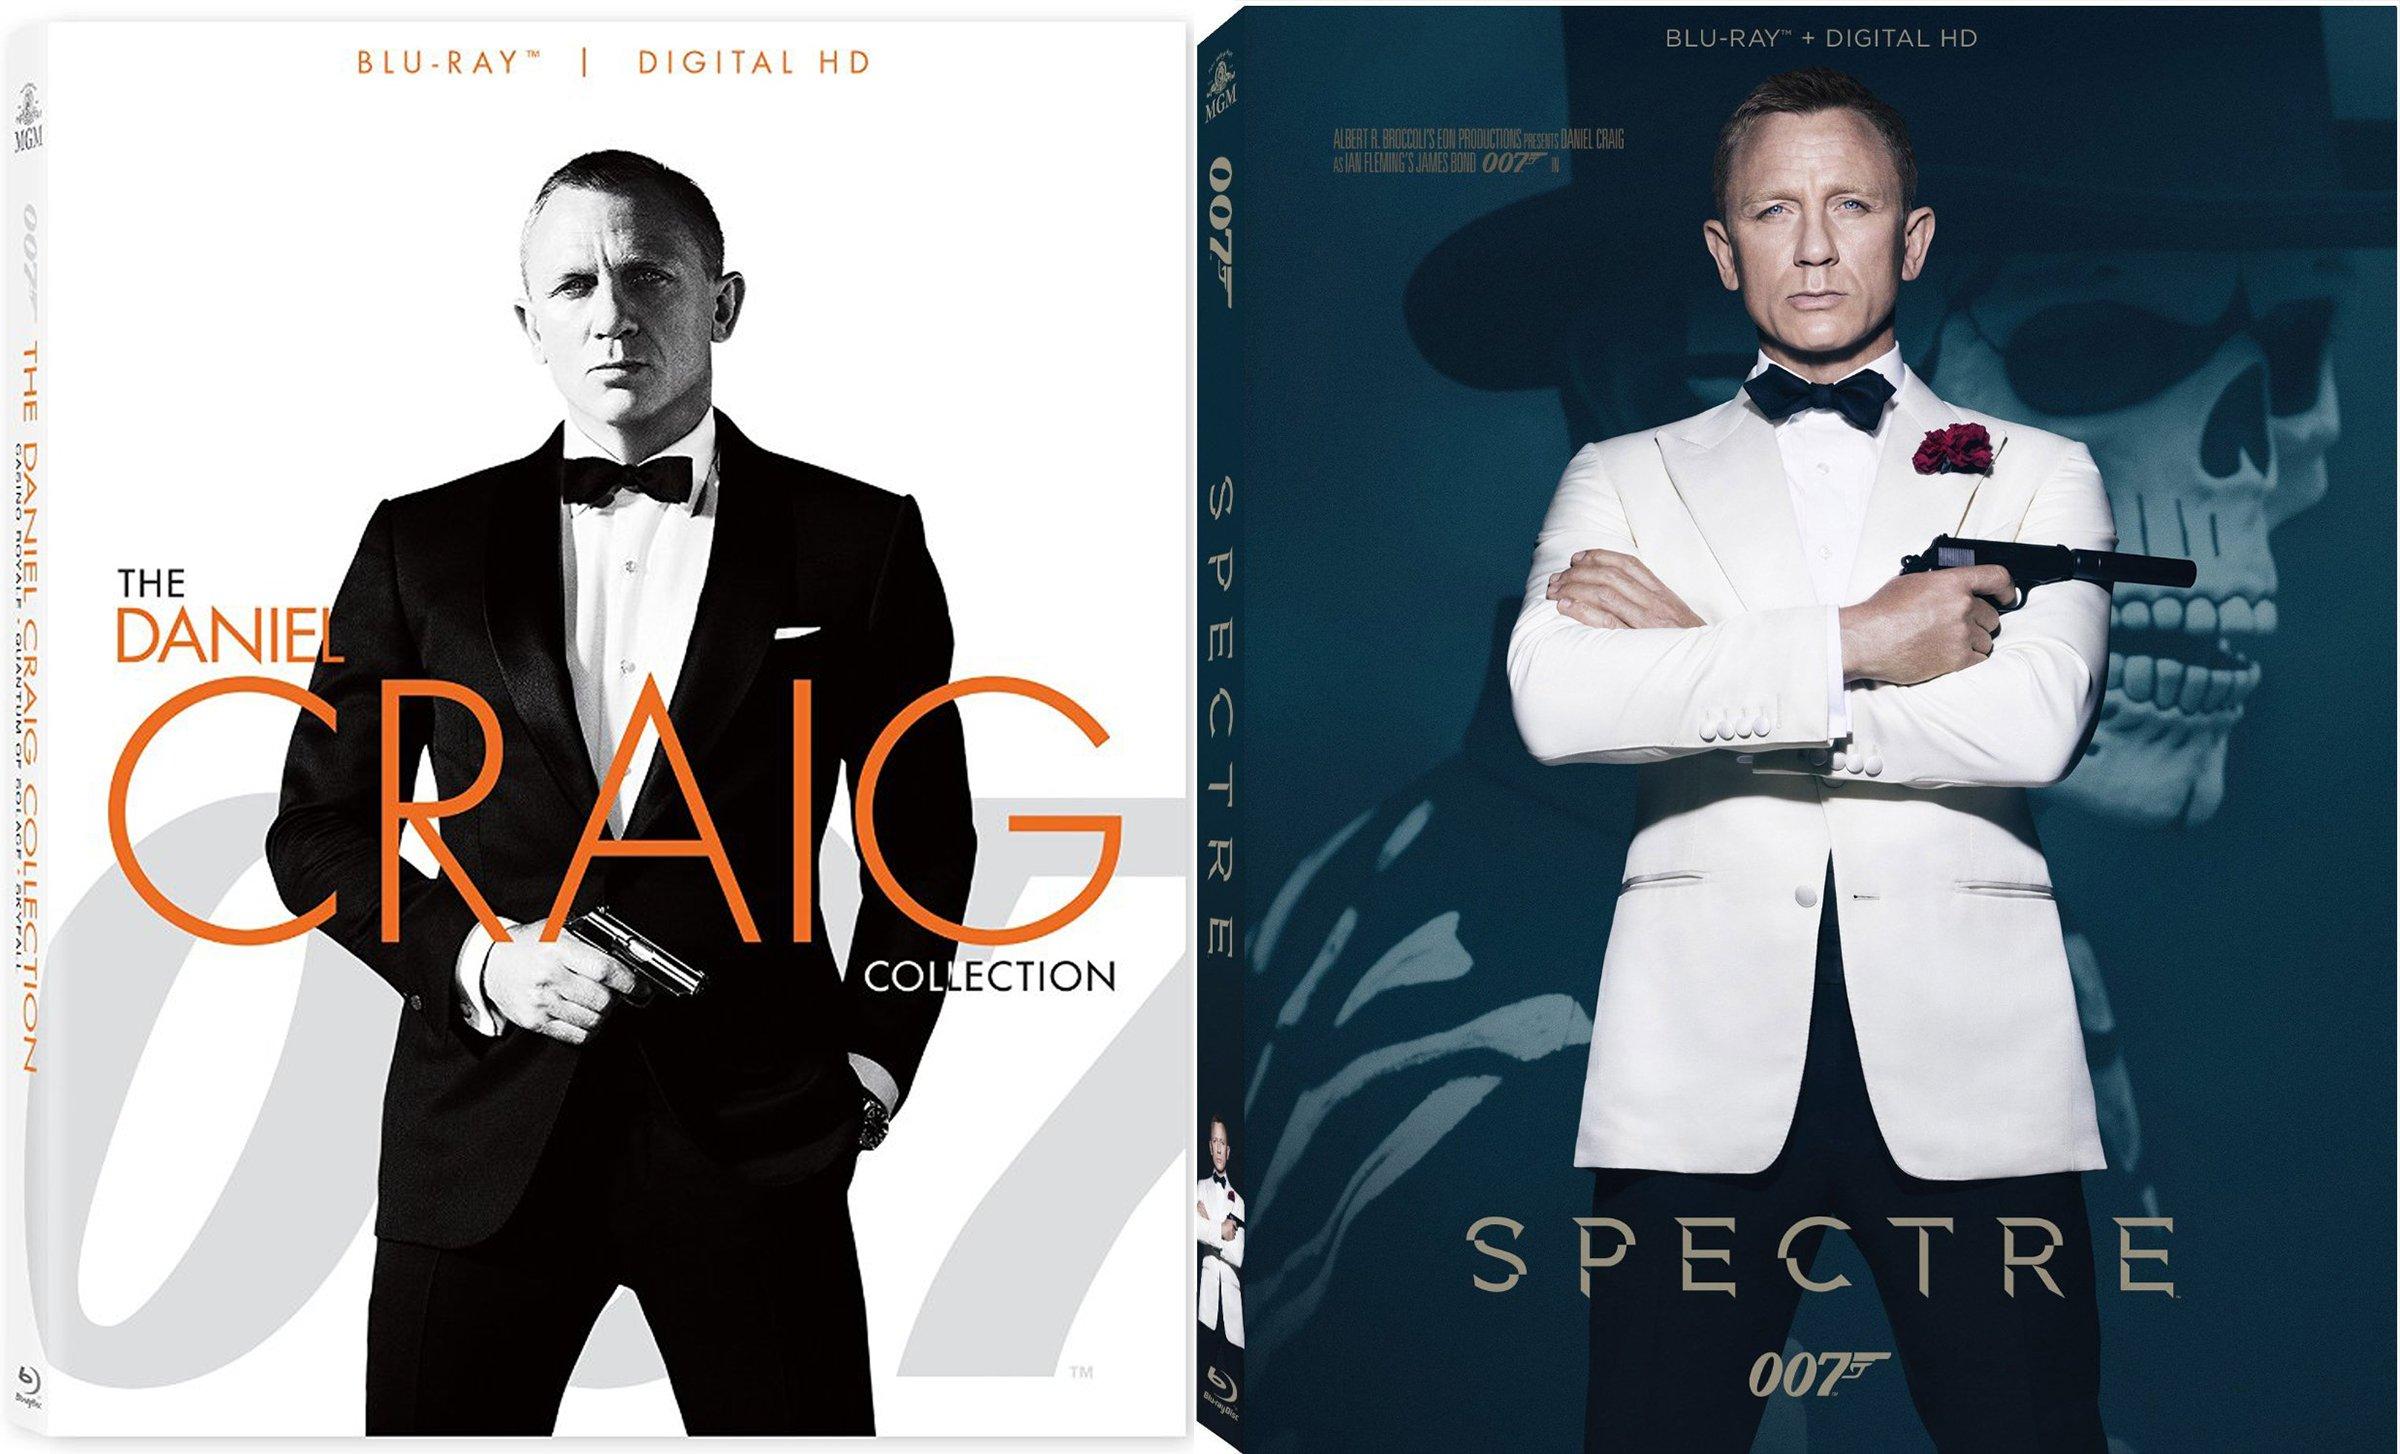 Spectre, Skyfall, Casino Royale Blu Ray & Quantum of Solace James Bond Set Pack 007 Daniel Craig Collection 007 Set